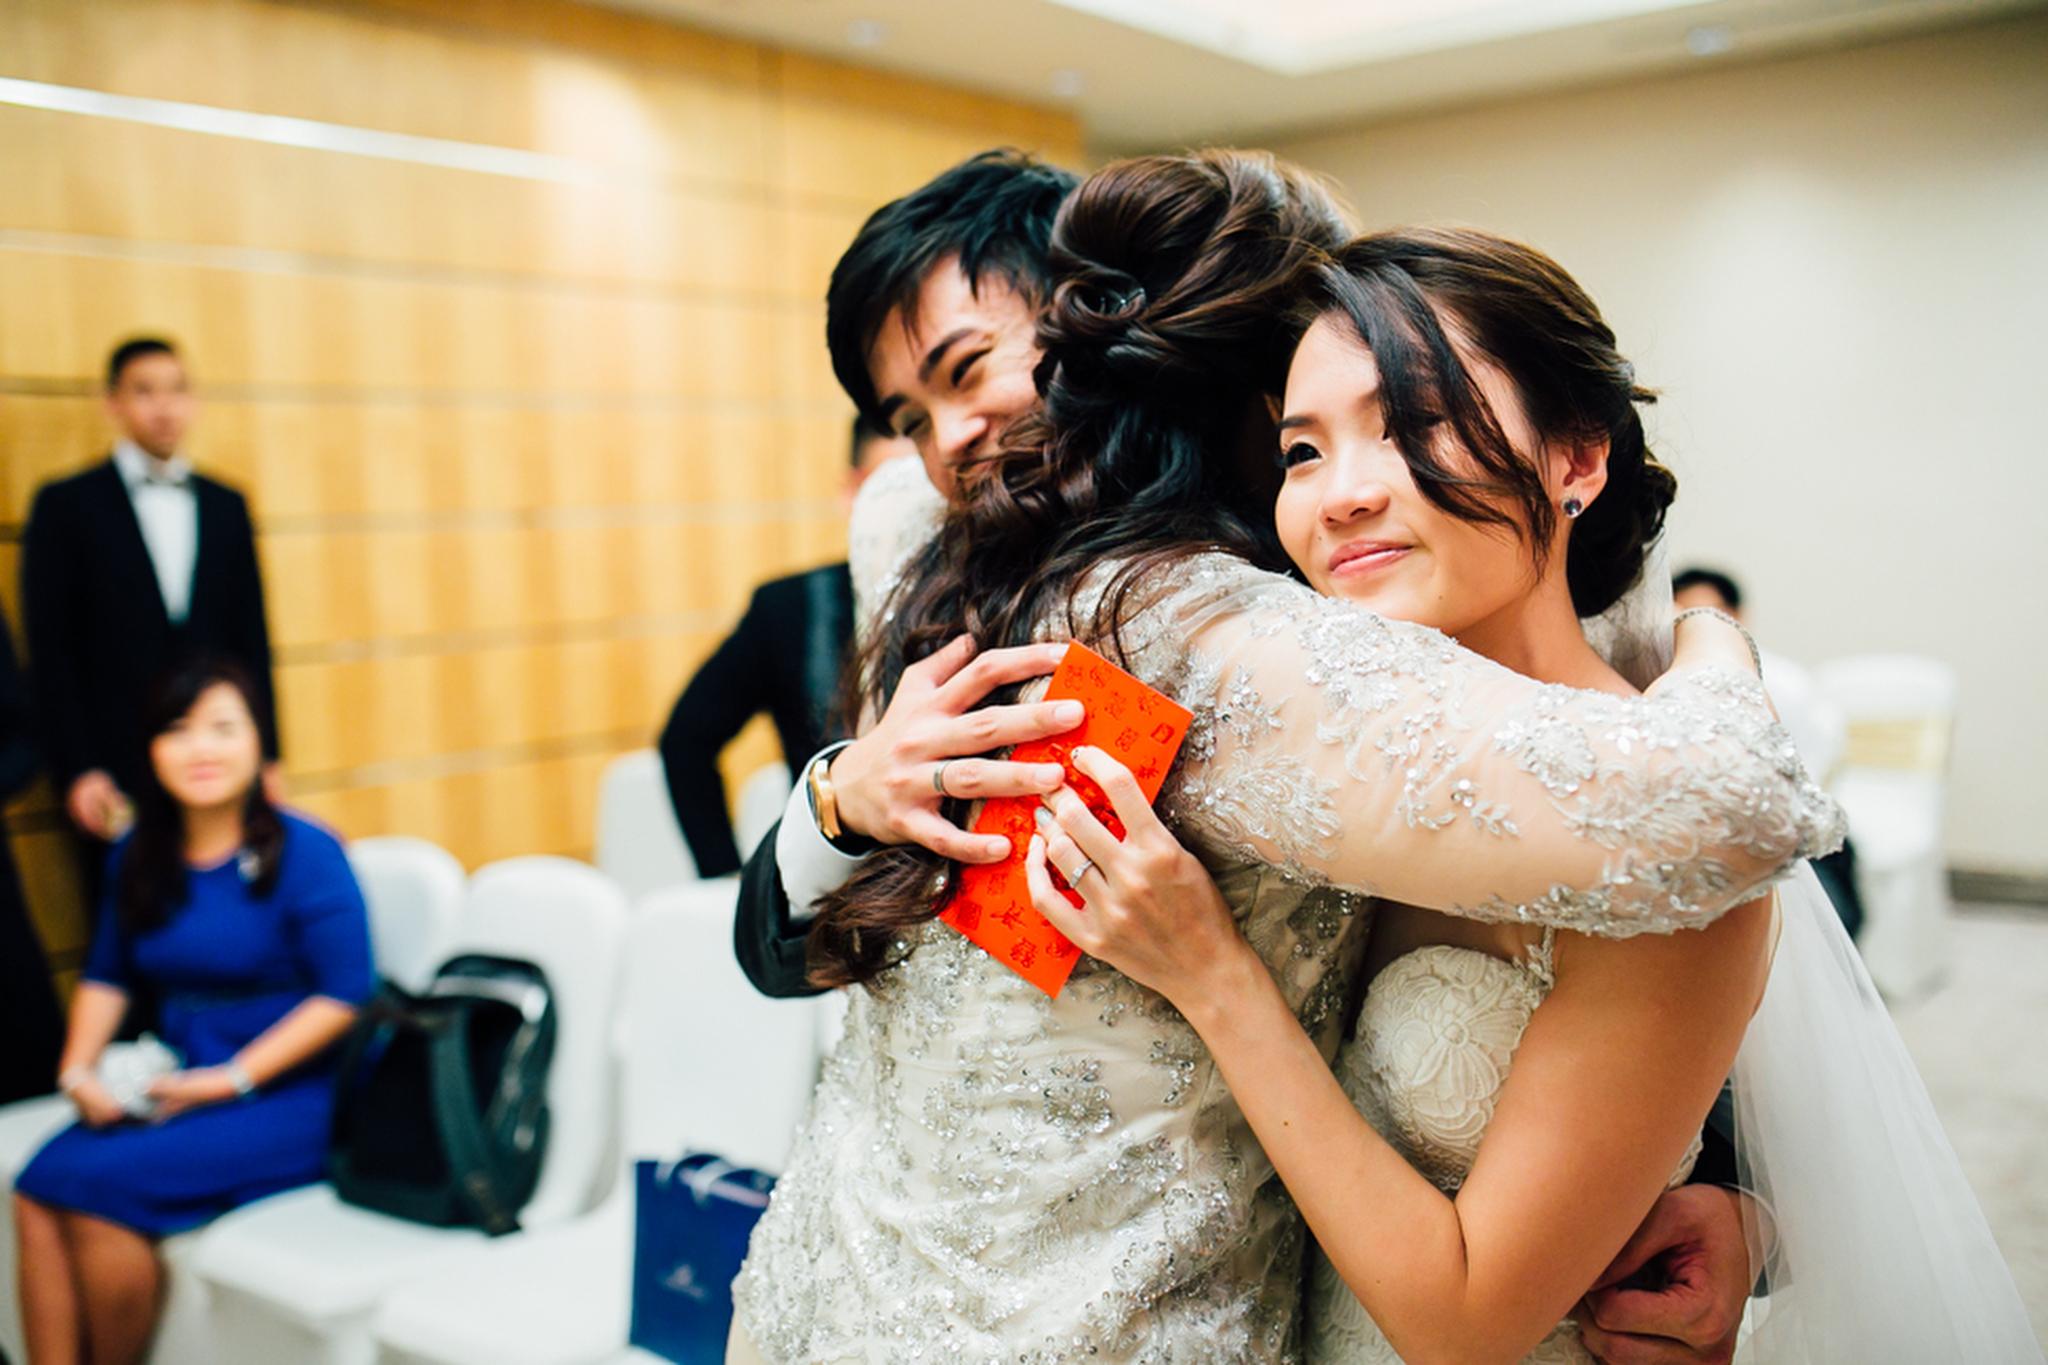 Singapore Wedding Photographer - Joey & Amily Wedding Day (91 of 154).JPG